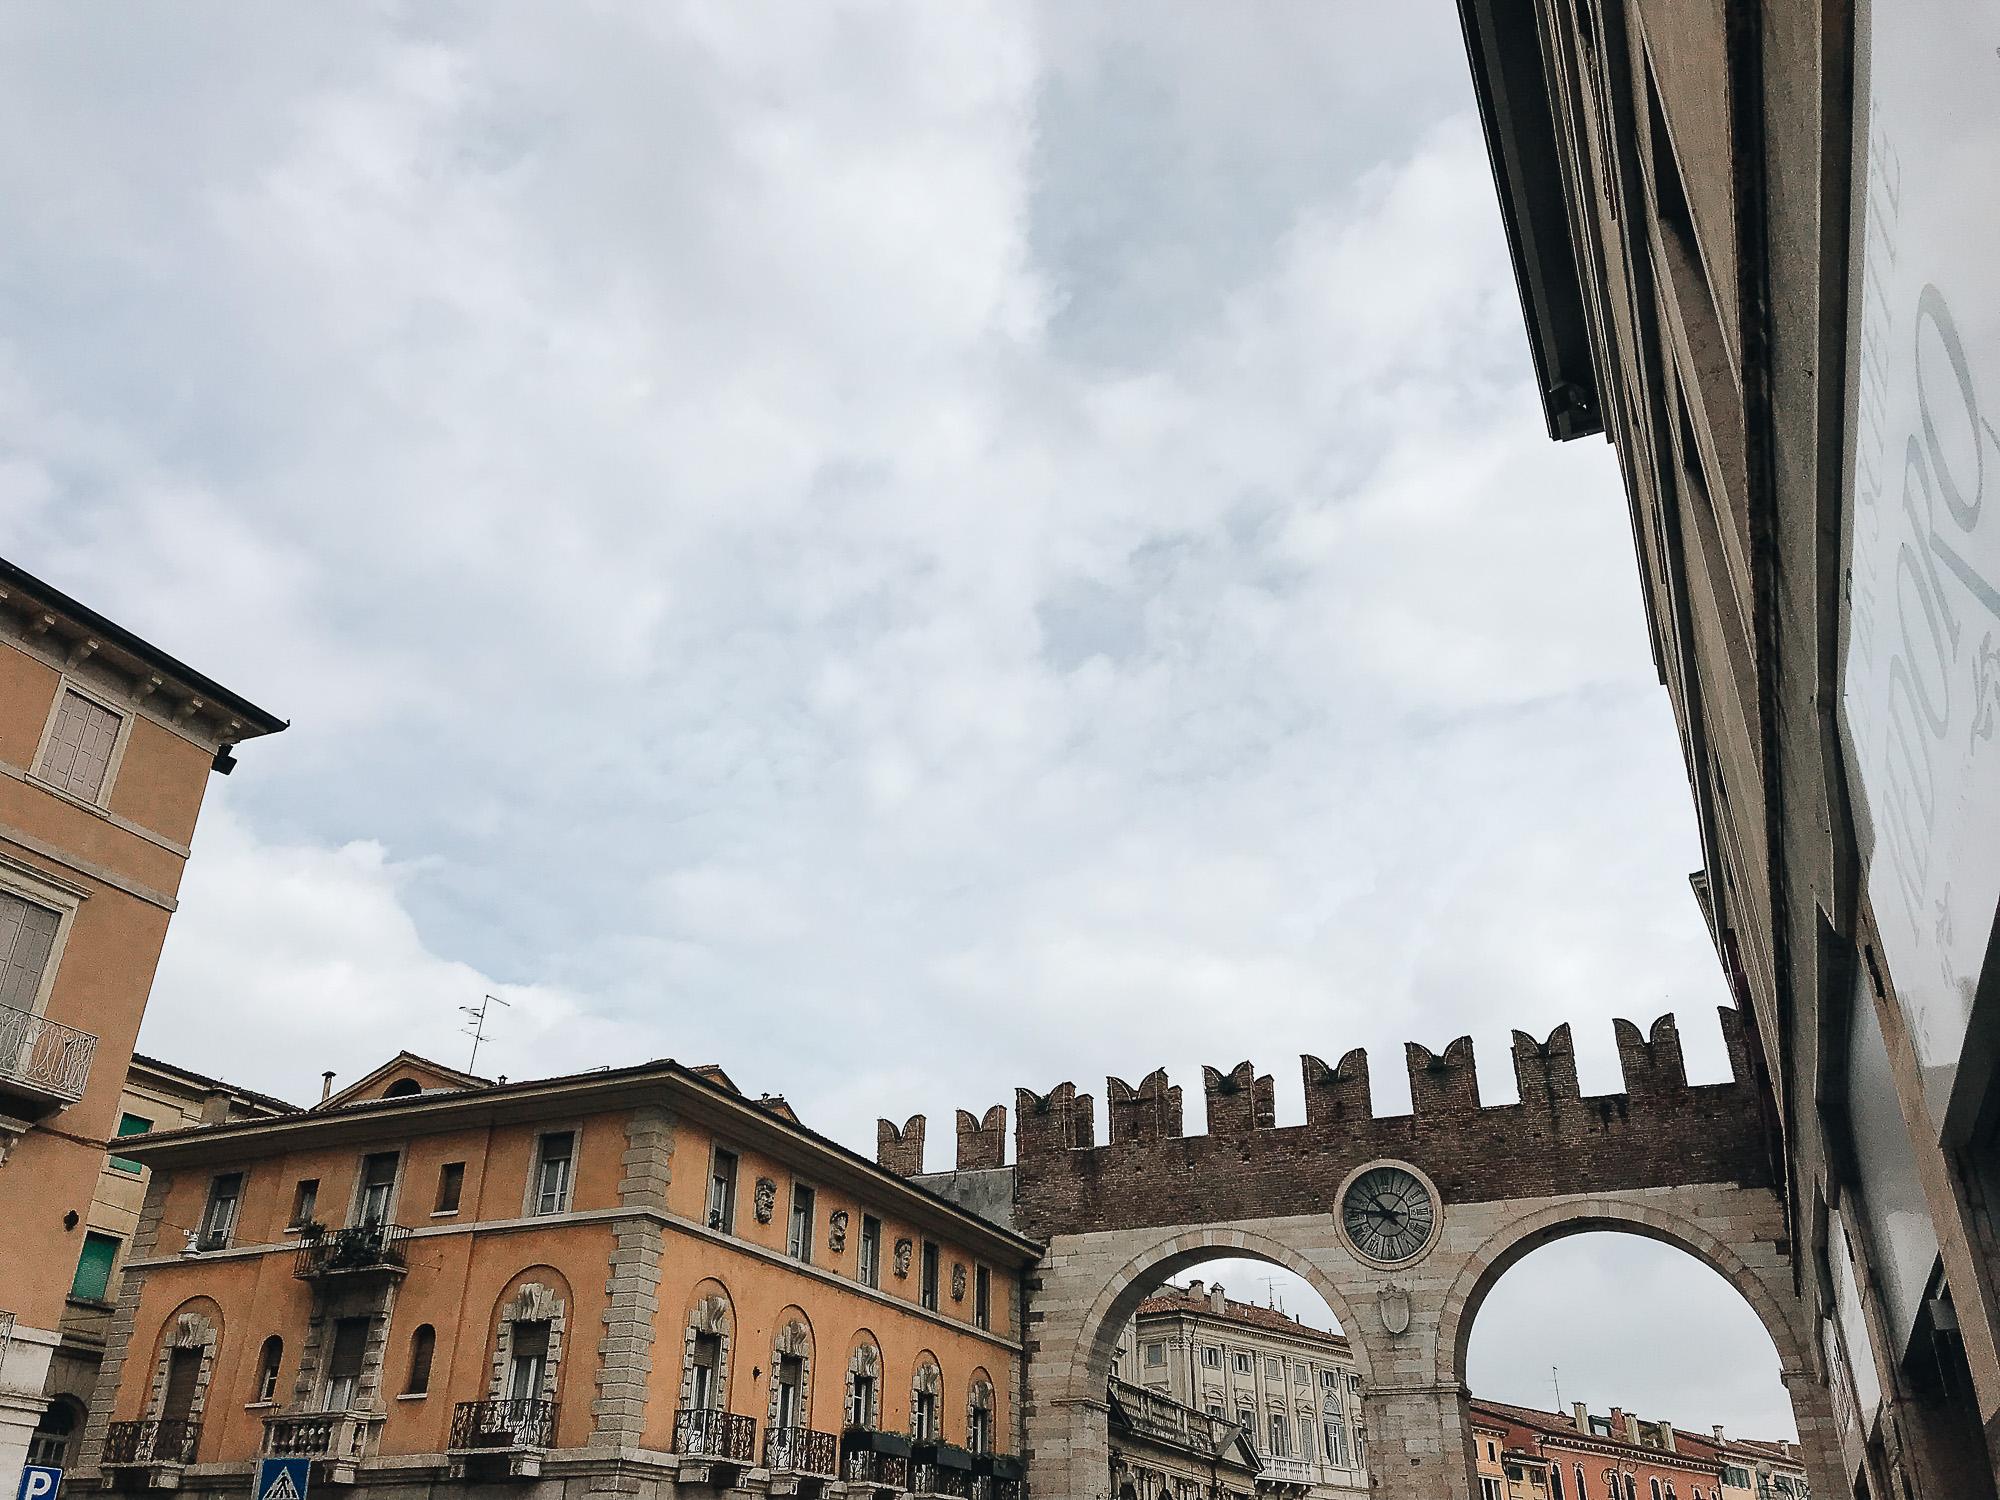 OurBeautifulAdventure-LakeGarda-Italy-Blog-6175.jpg